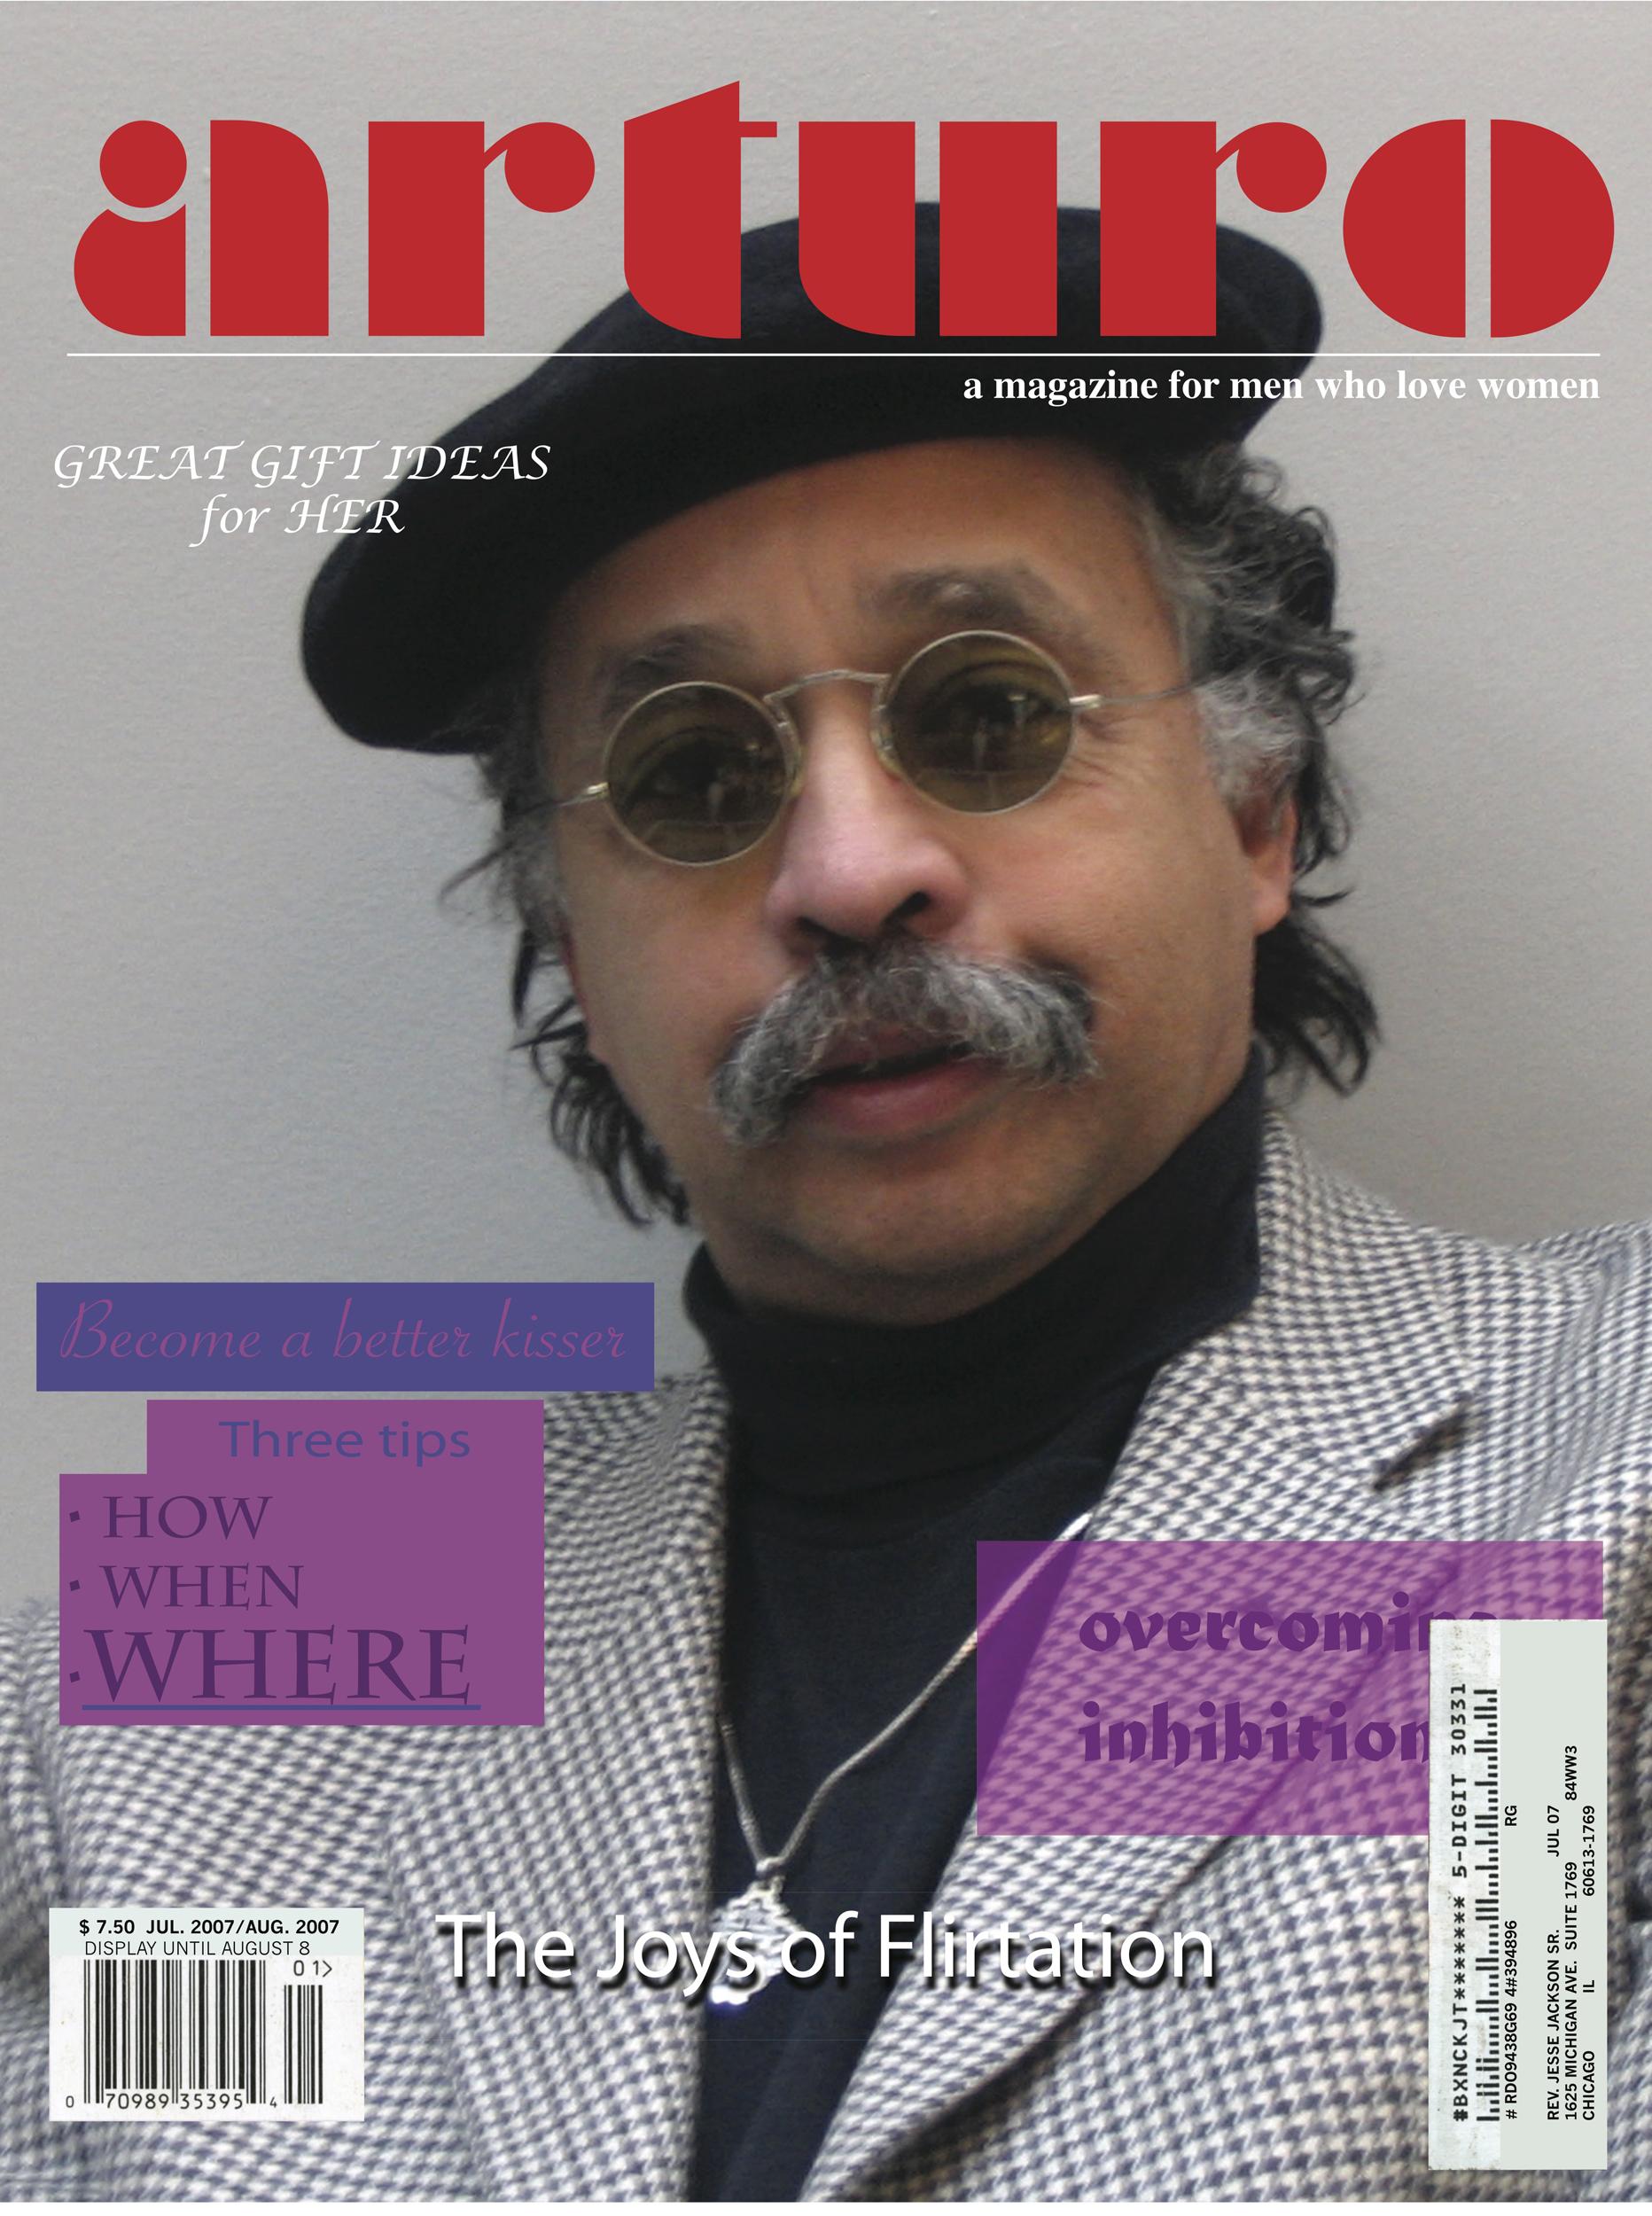 Arturo Magazine # 3, 2007